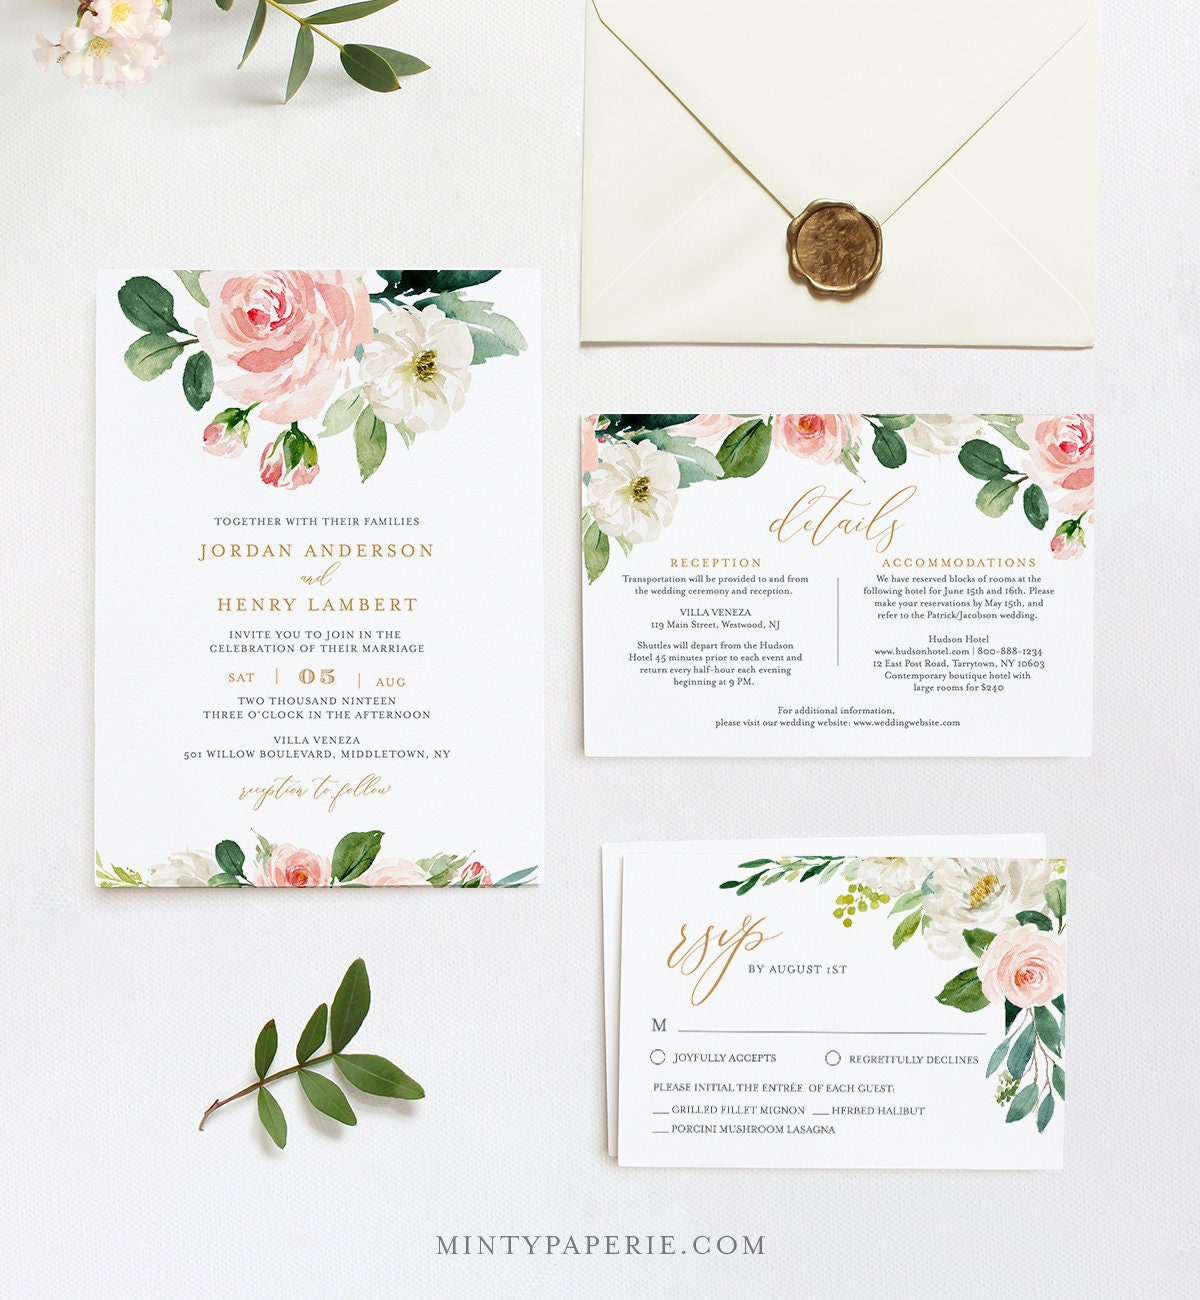 Editable Wedding Invitation Template Printable Invite RSVP Details